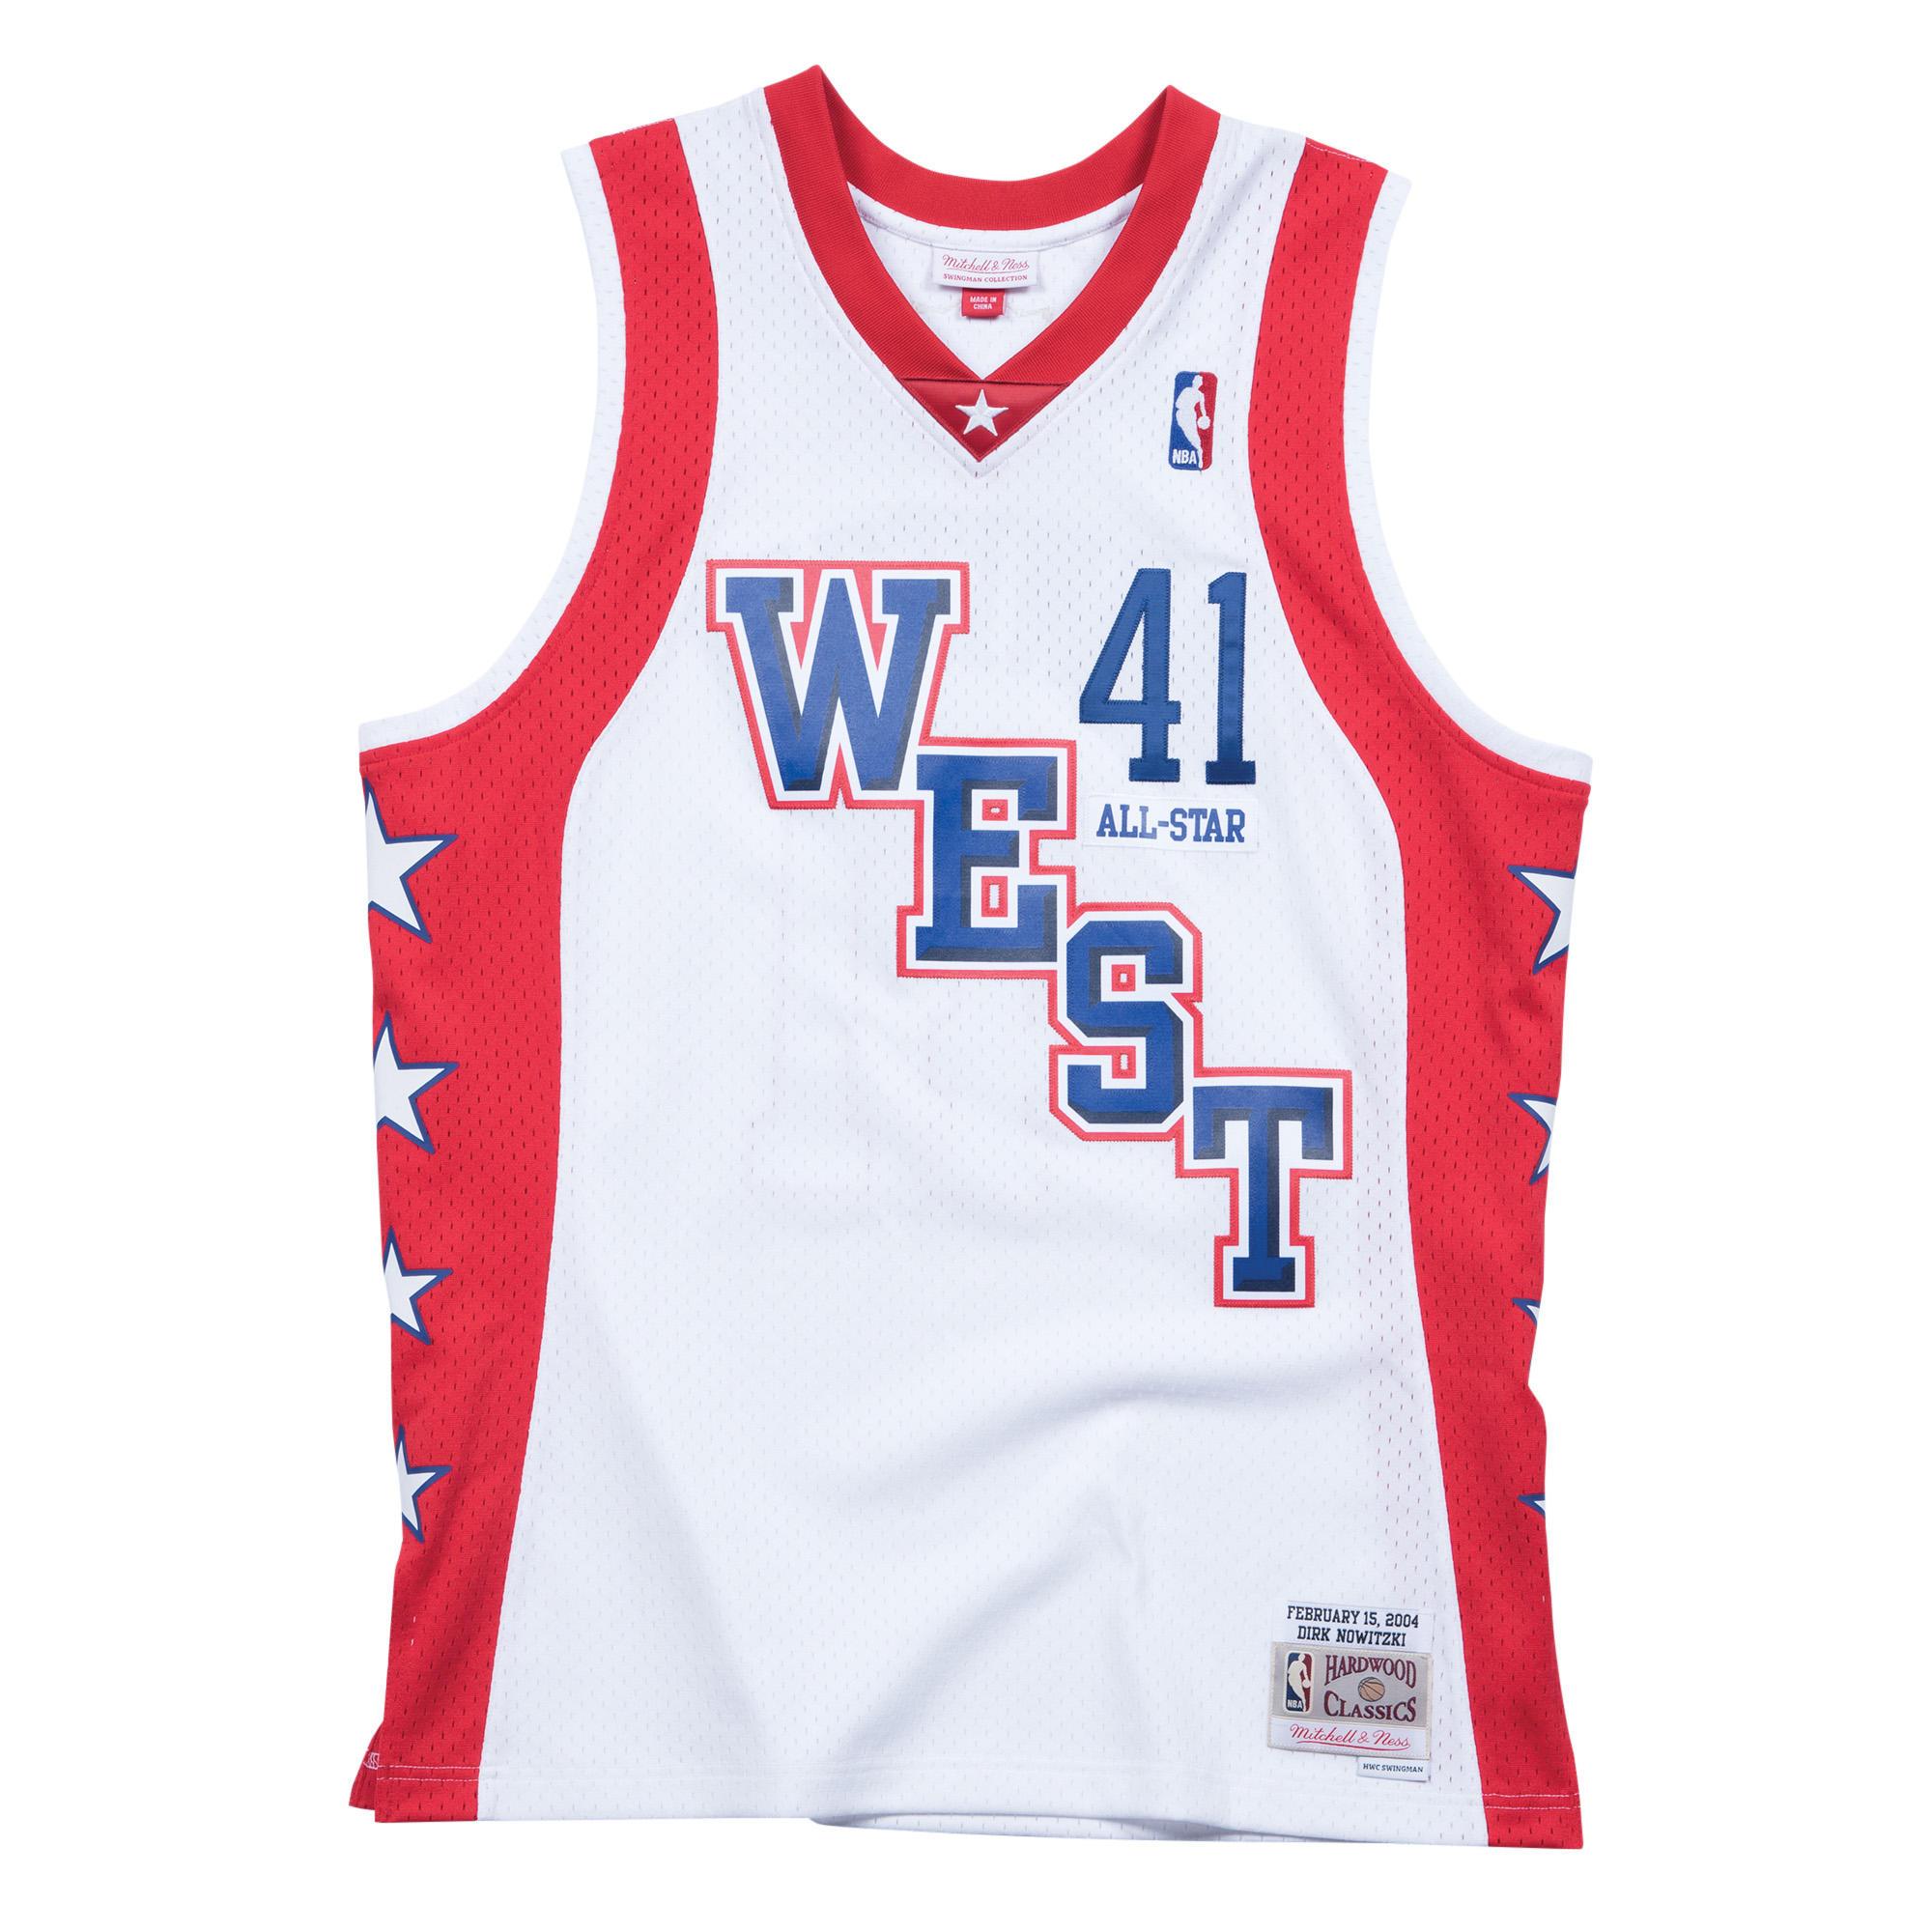 d61491d6c ... dirk nowitzki 2004 west swingman jersey nba all star